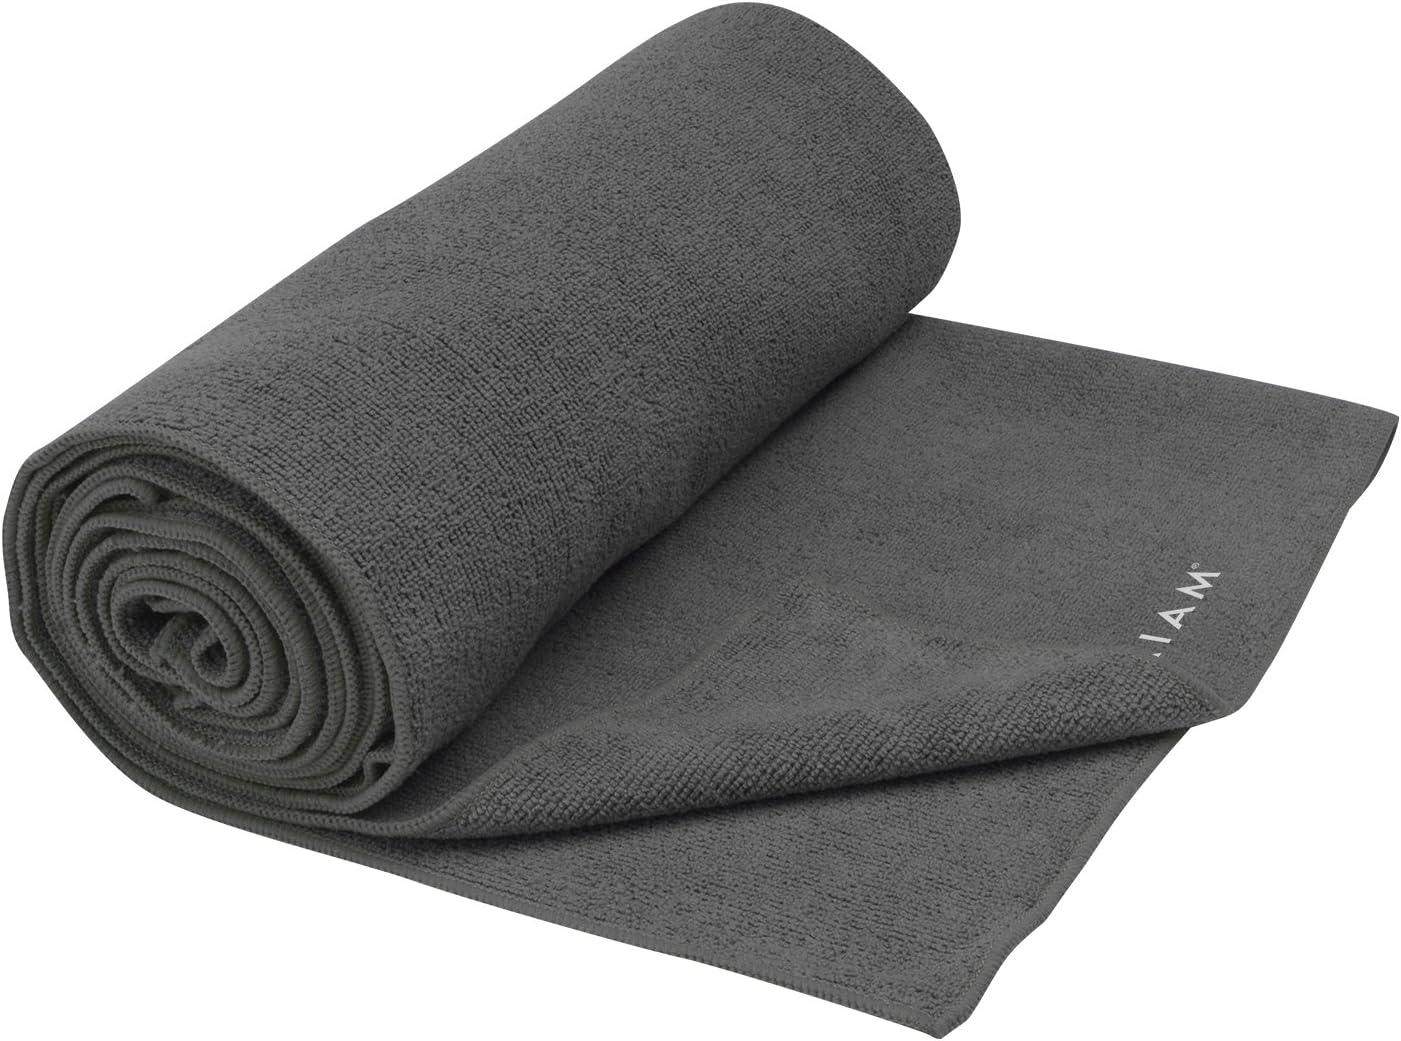 Gaiam Athletic Yoga Series maxTowel Xtra-Large Yoga Mat Towel